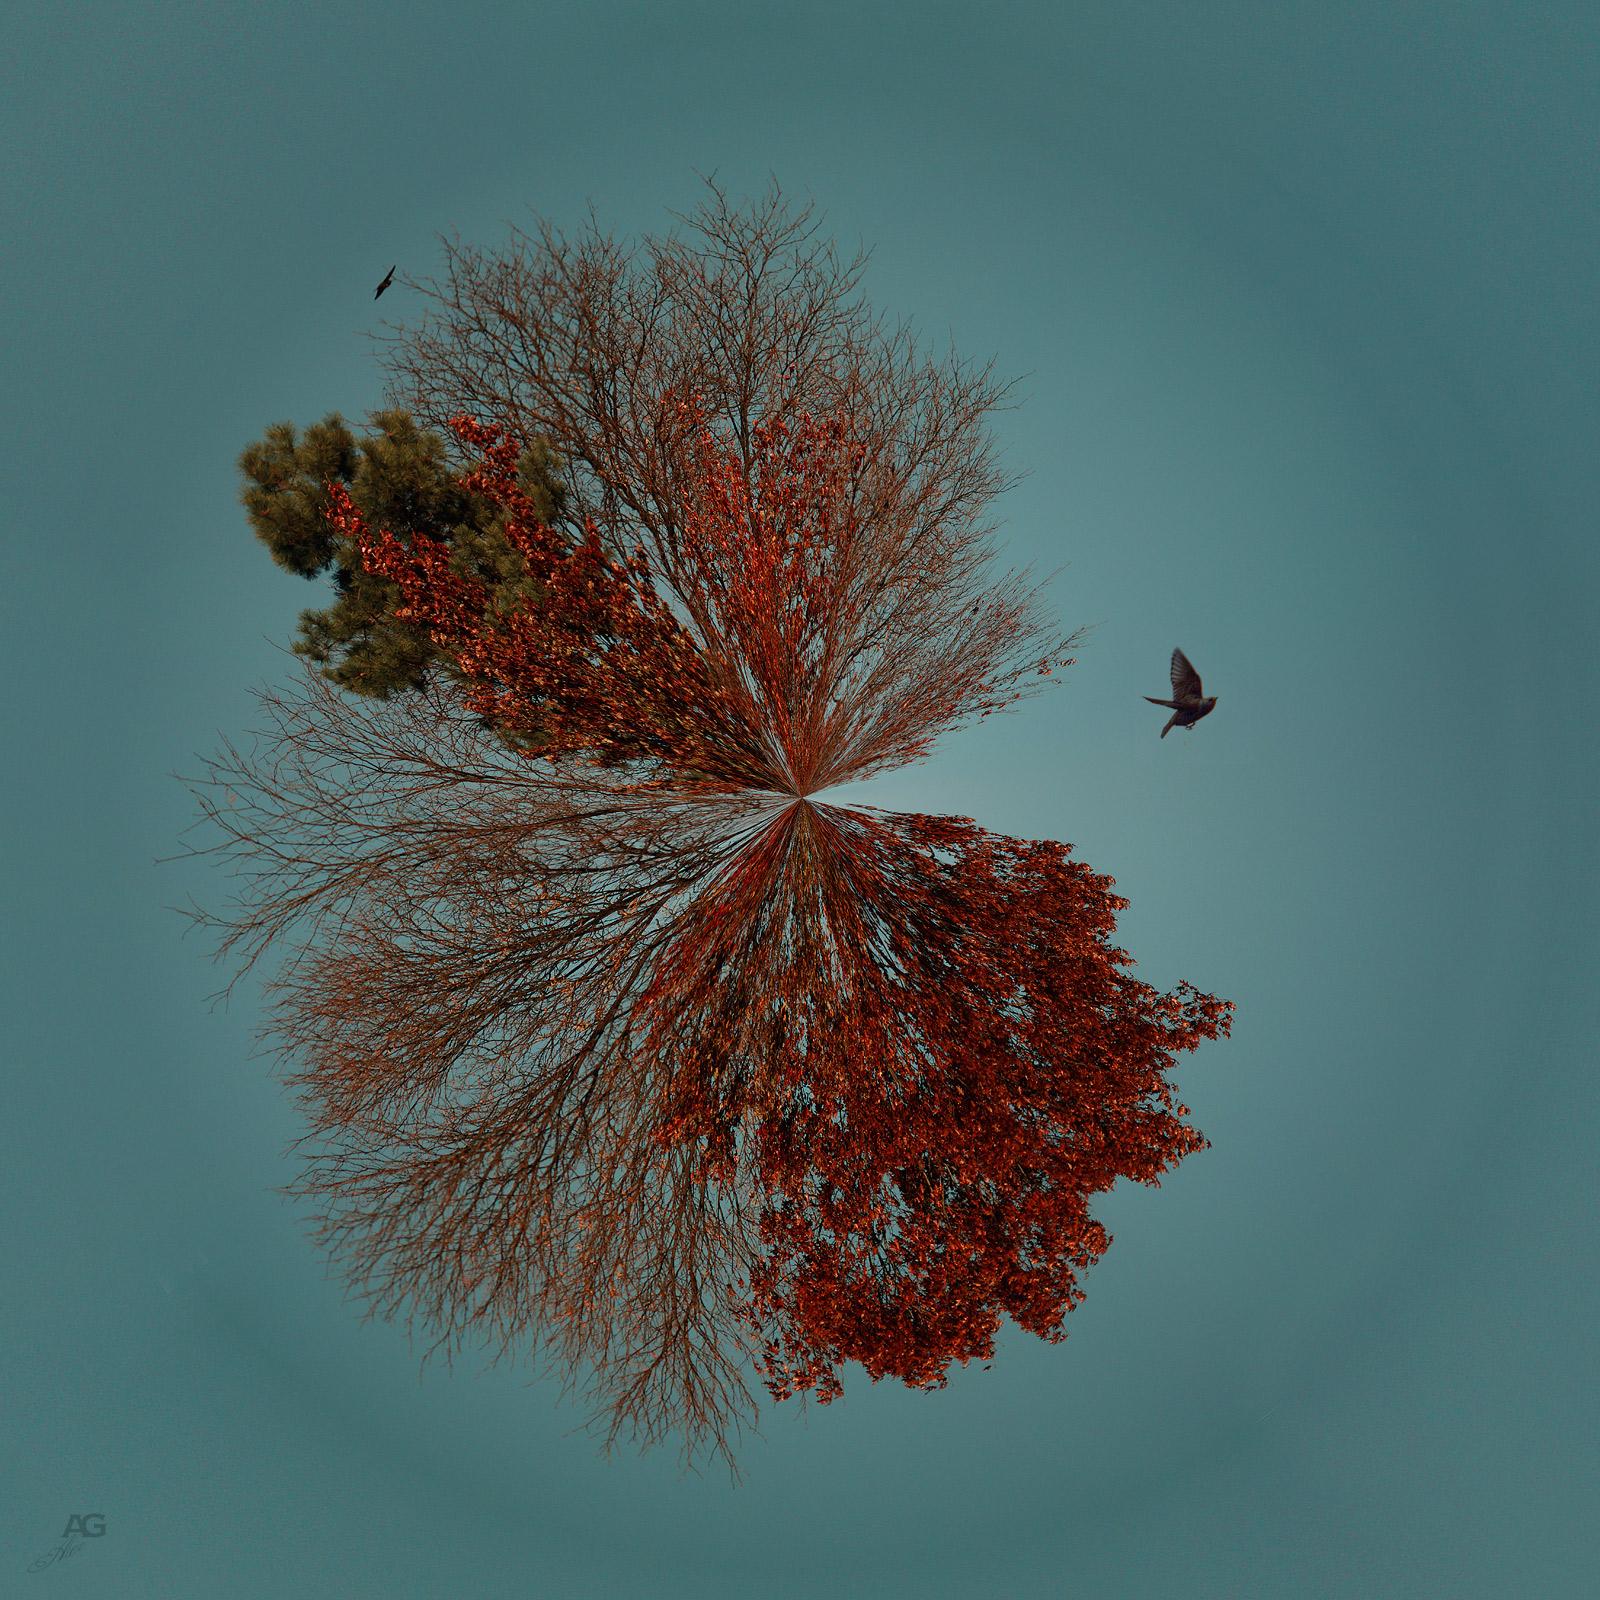 OnlyTopsOfTheTrees_StatenIsland_POLAR_1600